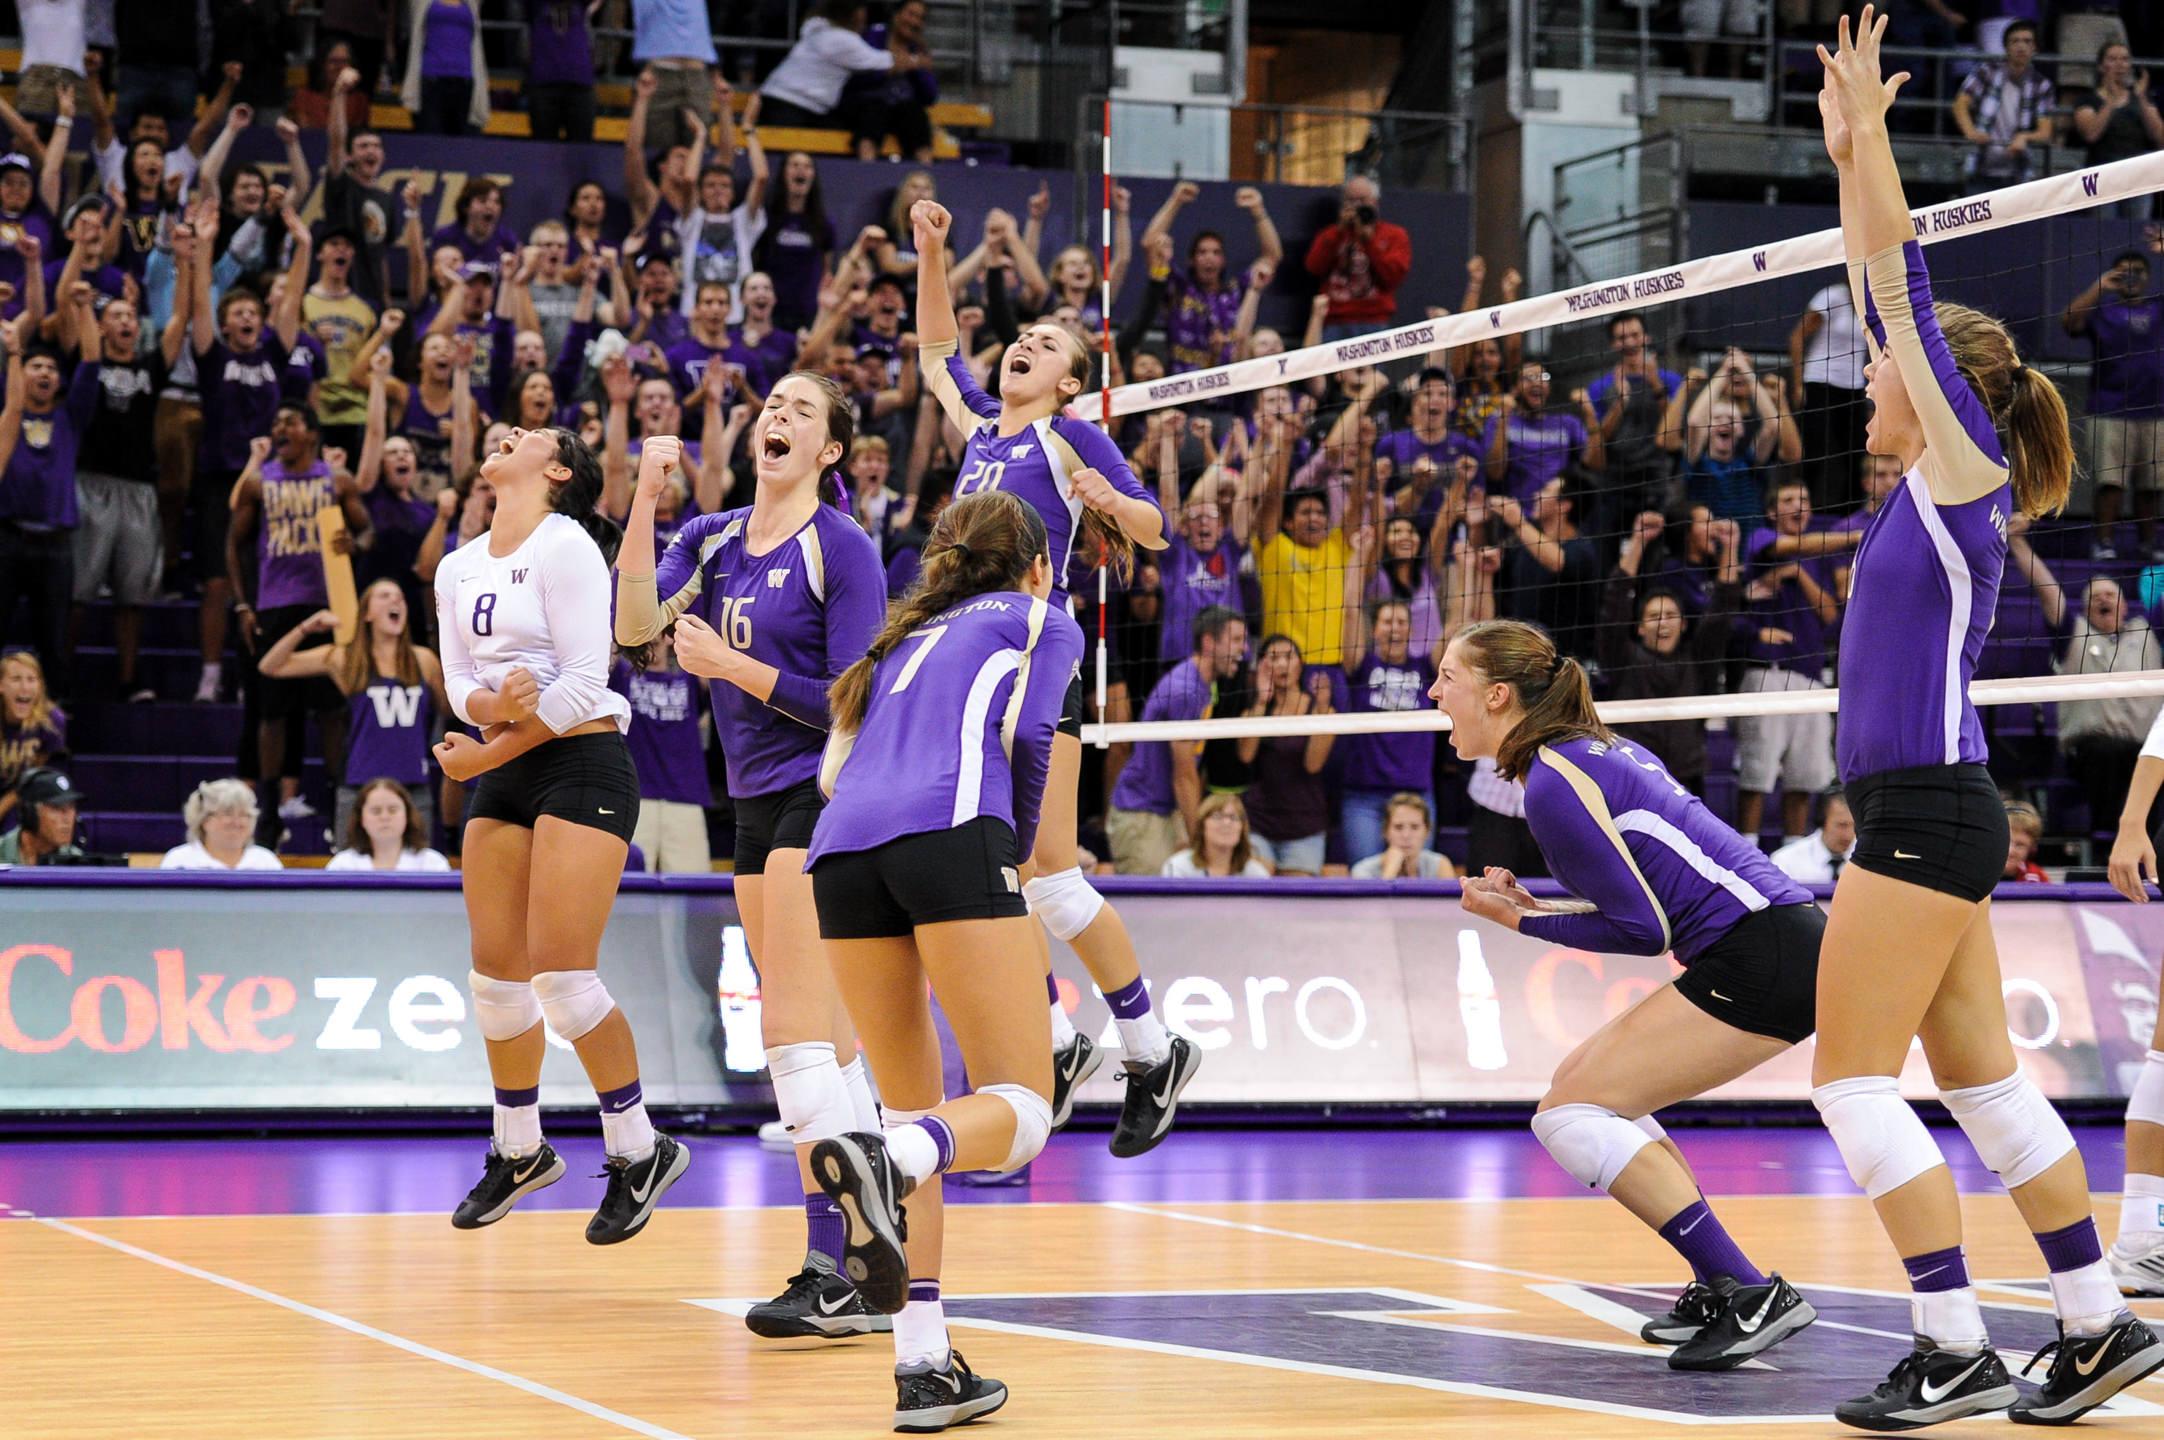 University of Washington Huskies Volleyball Celebration